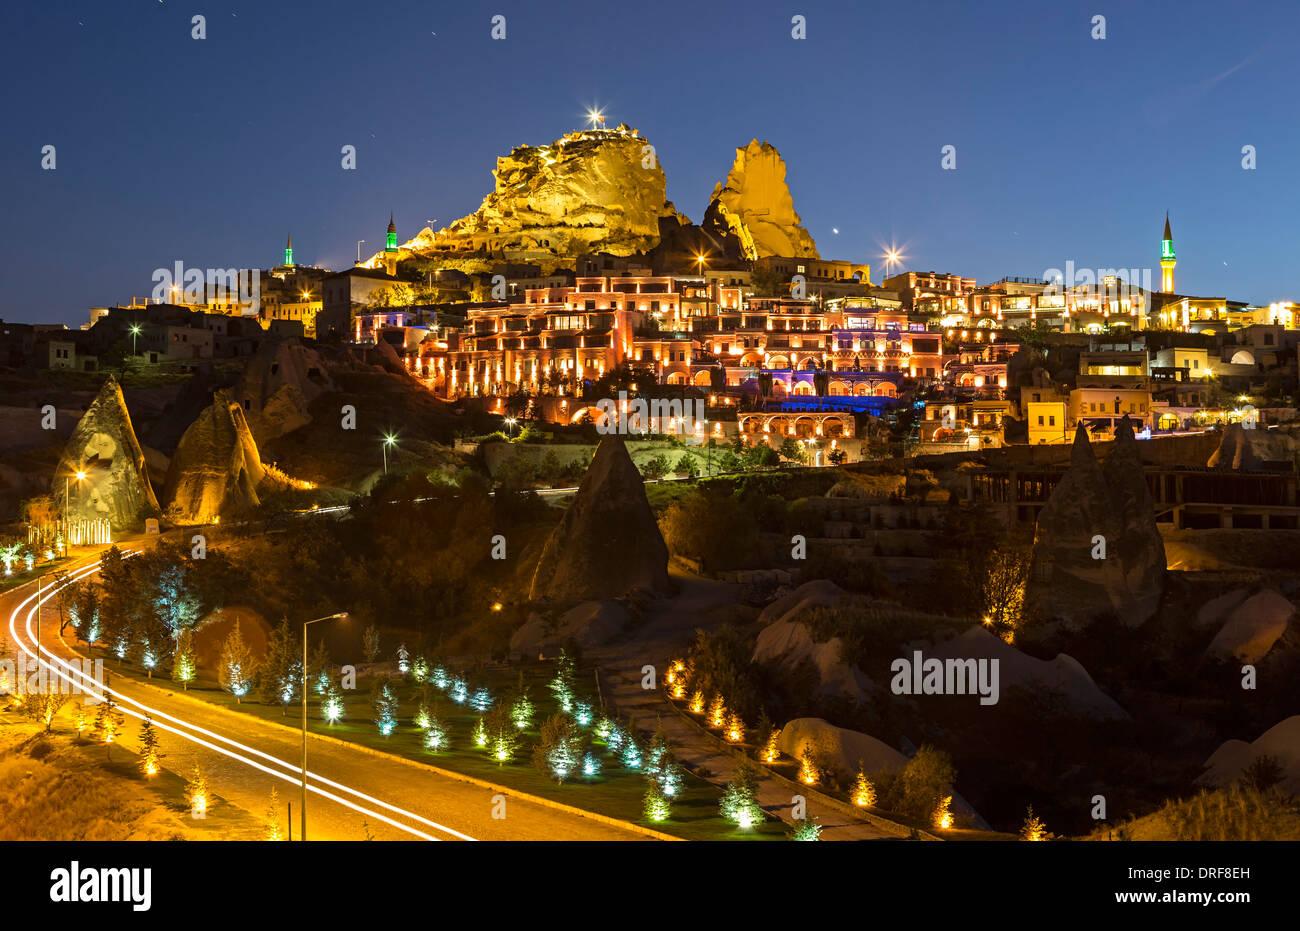 Uchisar Castle and Village, Cappadocia, Turkey Stock Photo, Royalty Free Imag...